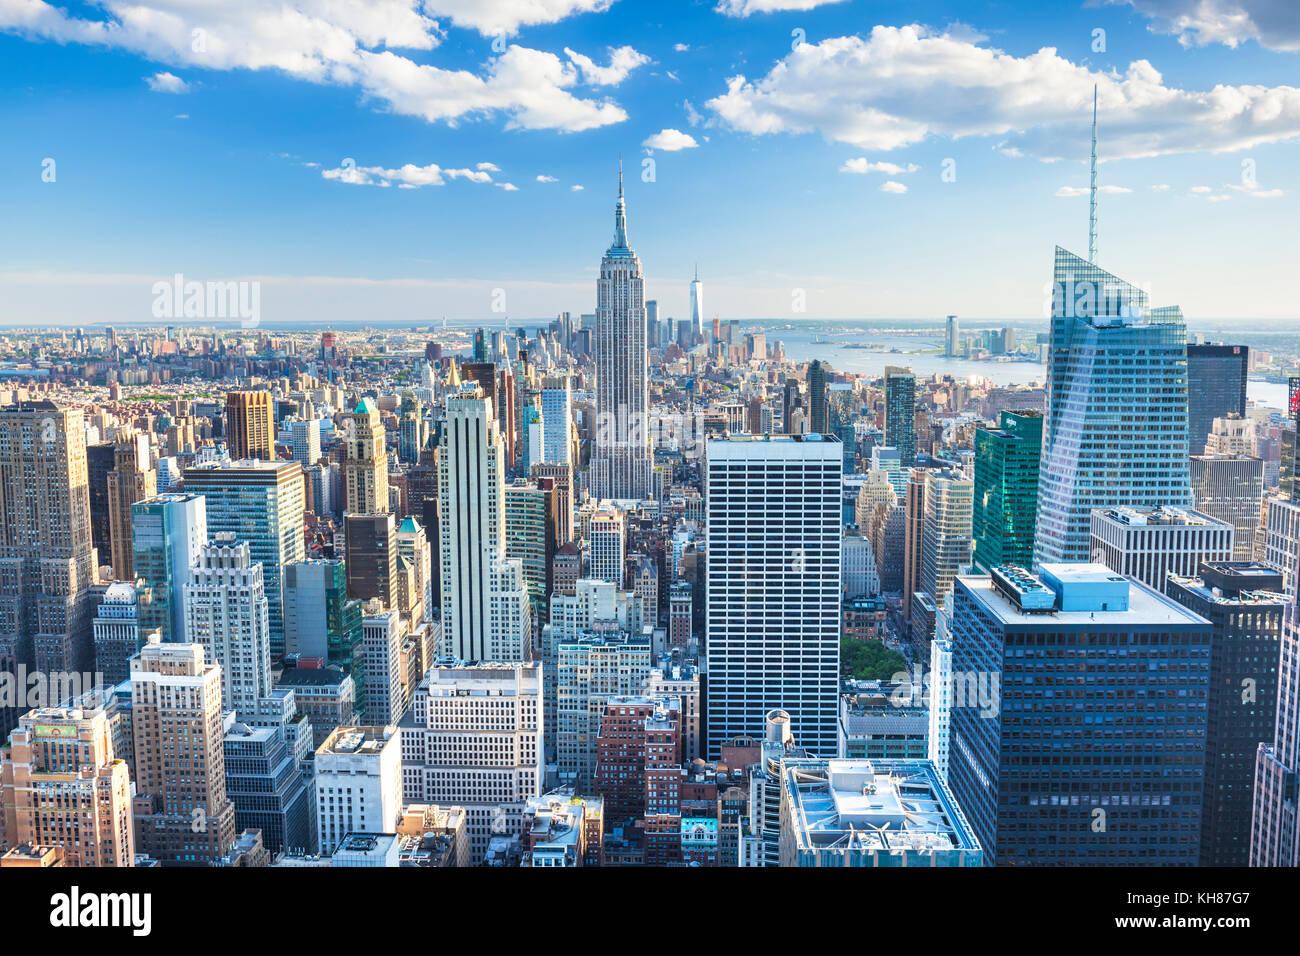 Skyline di Manhattan, New York skyline, Empire State Building di New York City, Stati Uniti d'America, America Immagini Stock